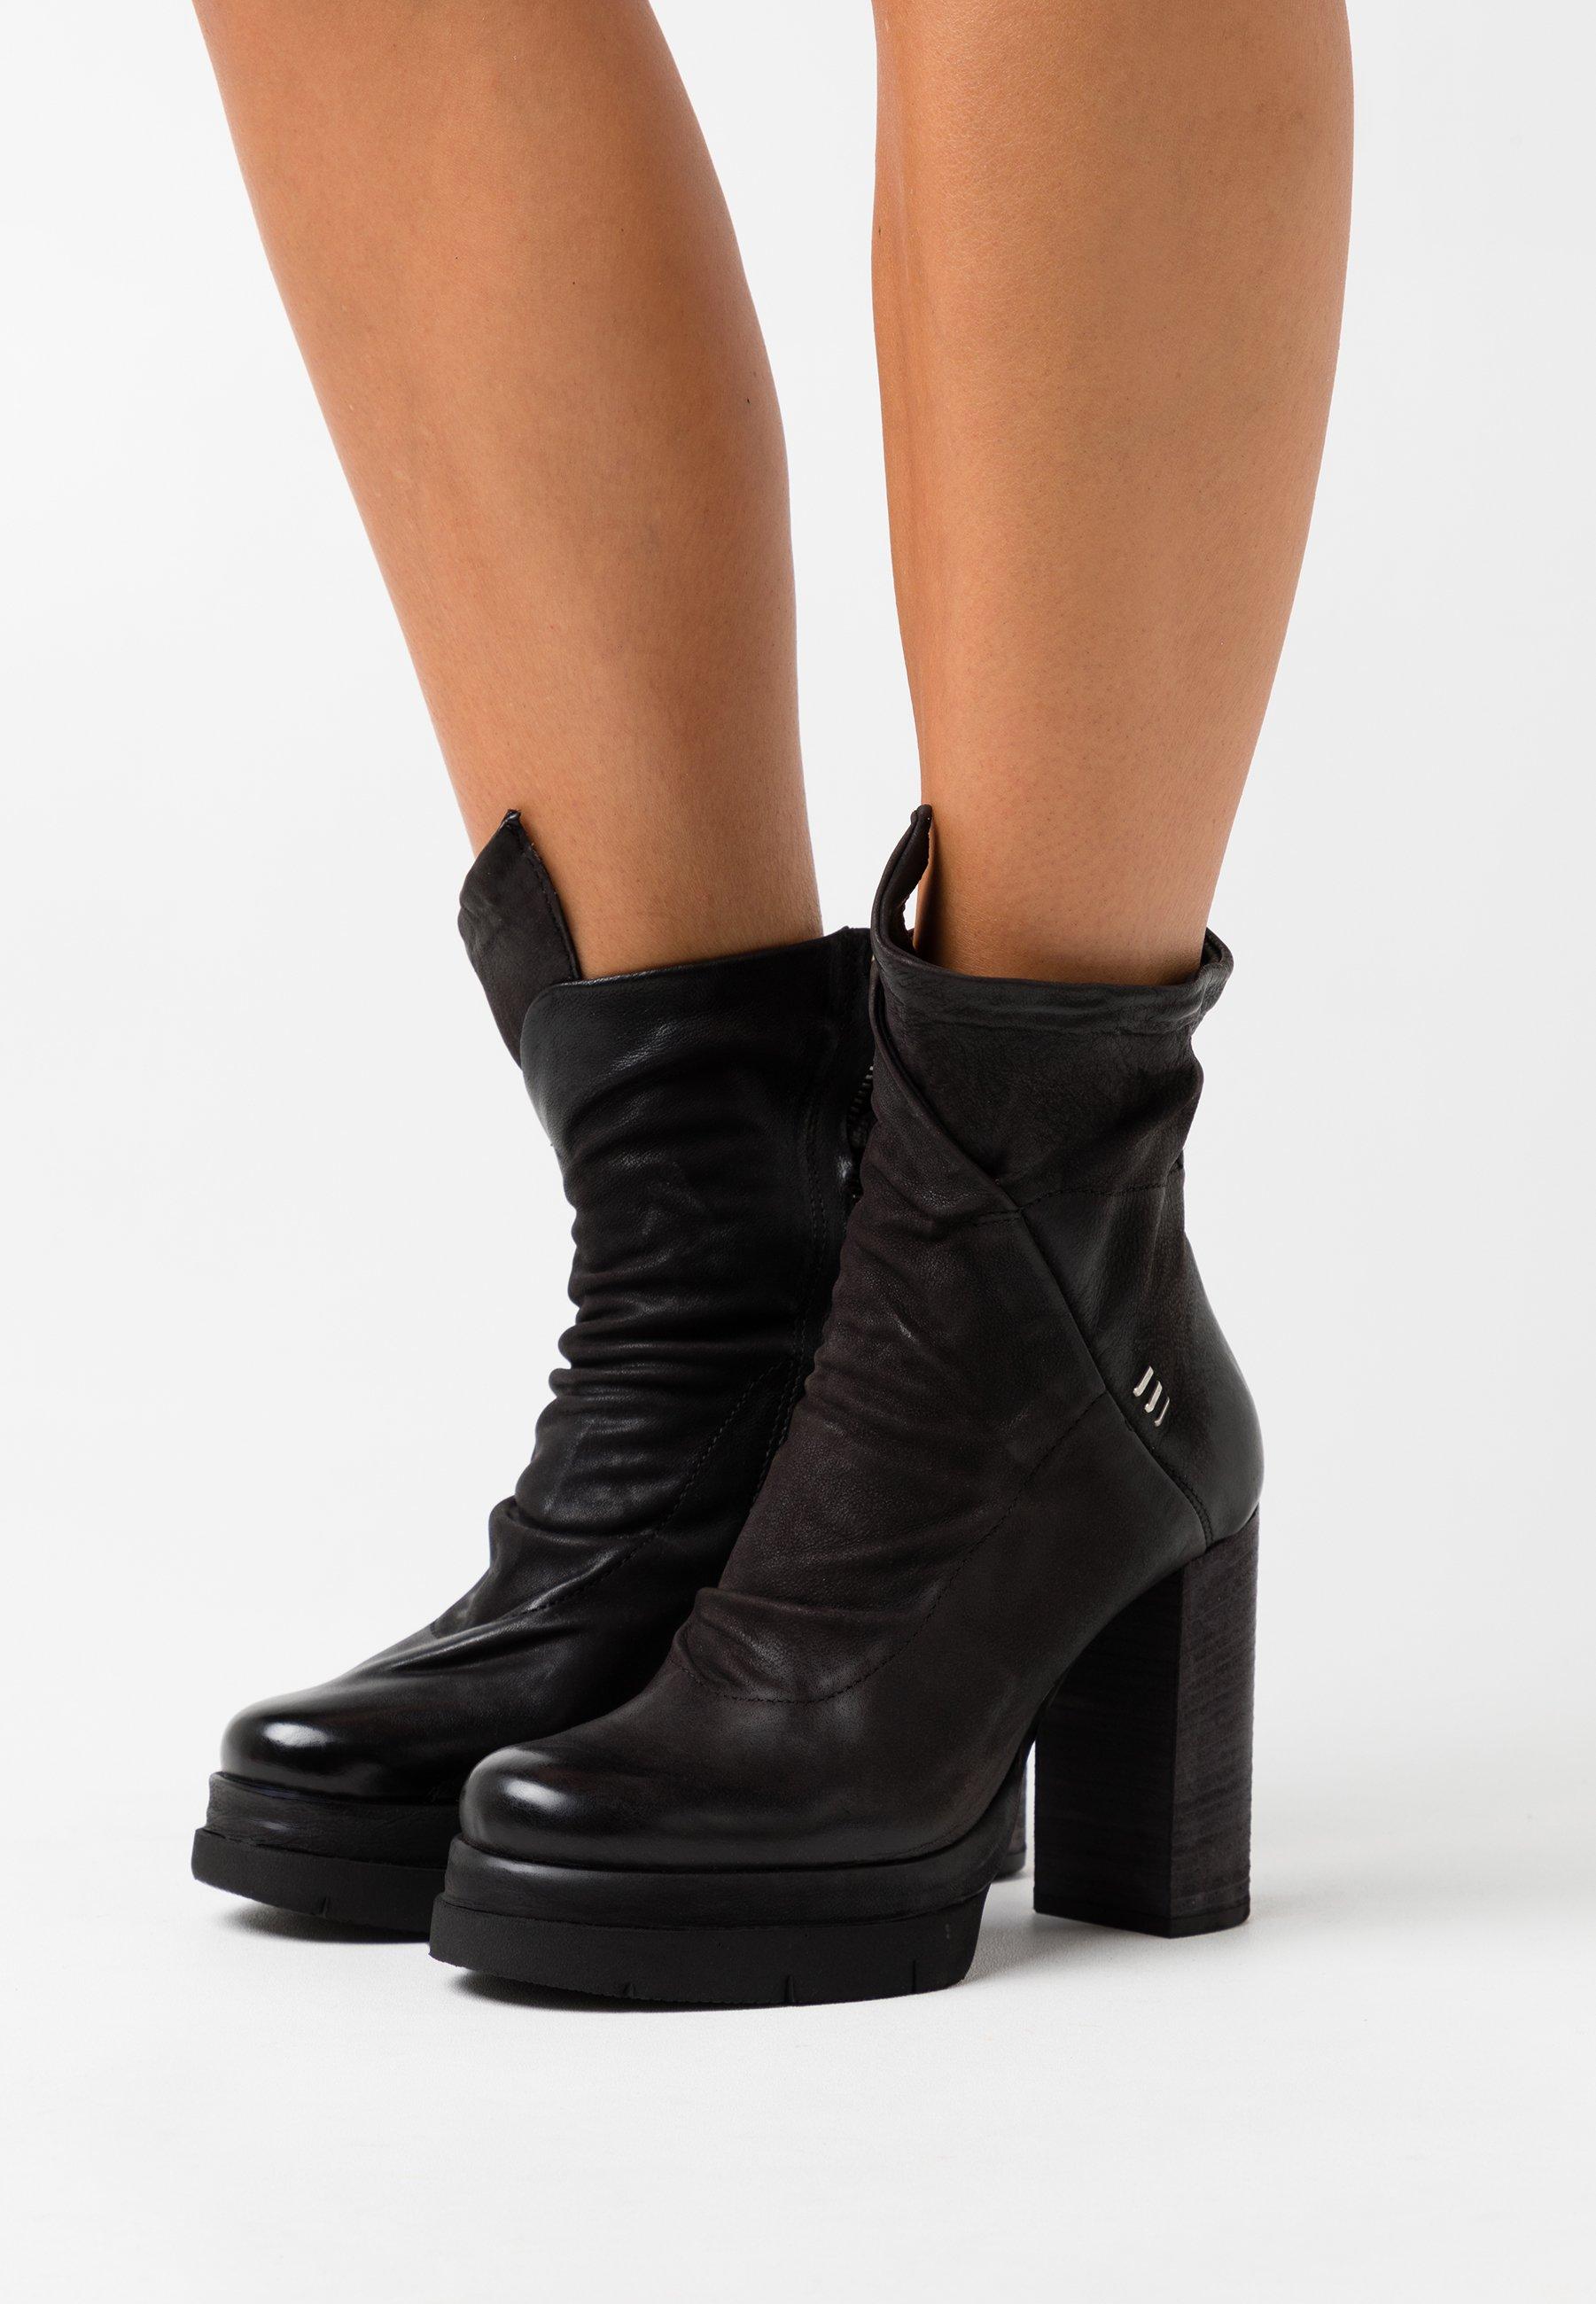 A.S.98 Plateaustiefelette - nero | Damen Schuhe 2020